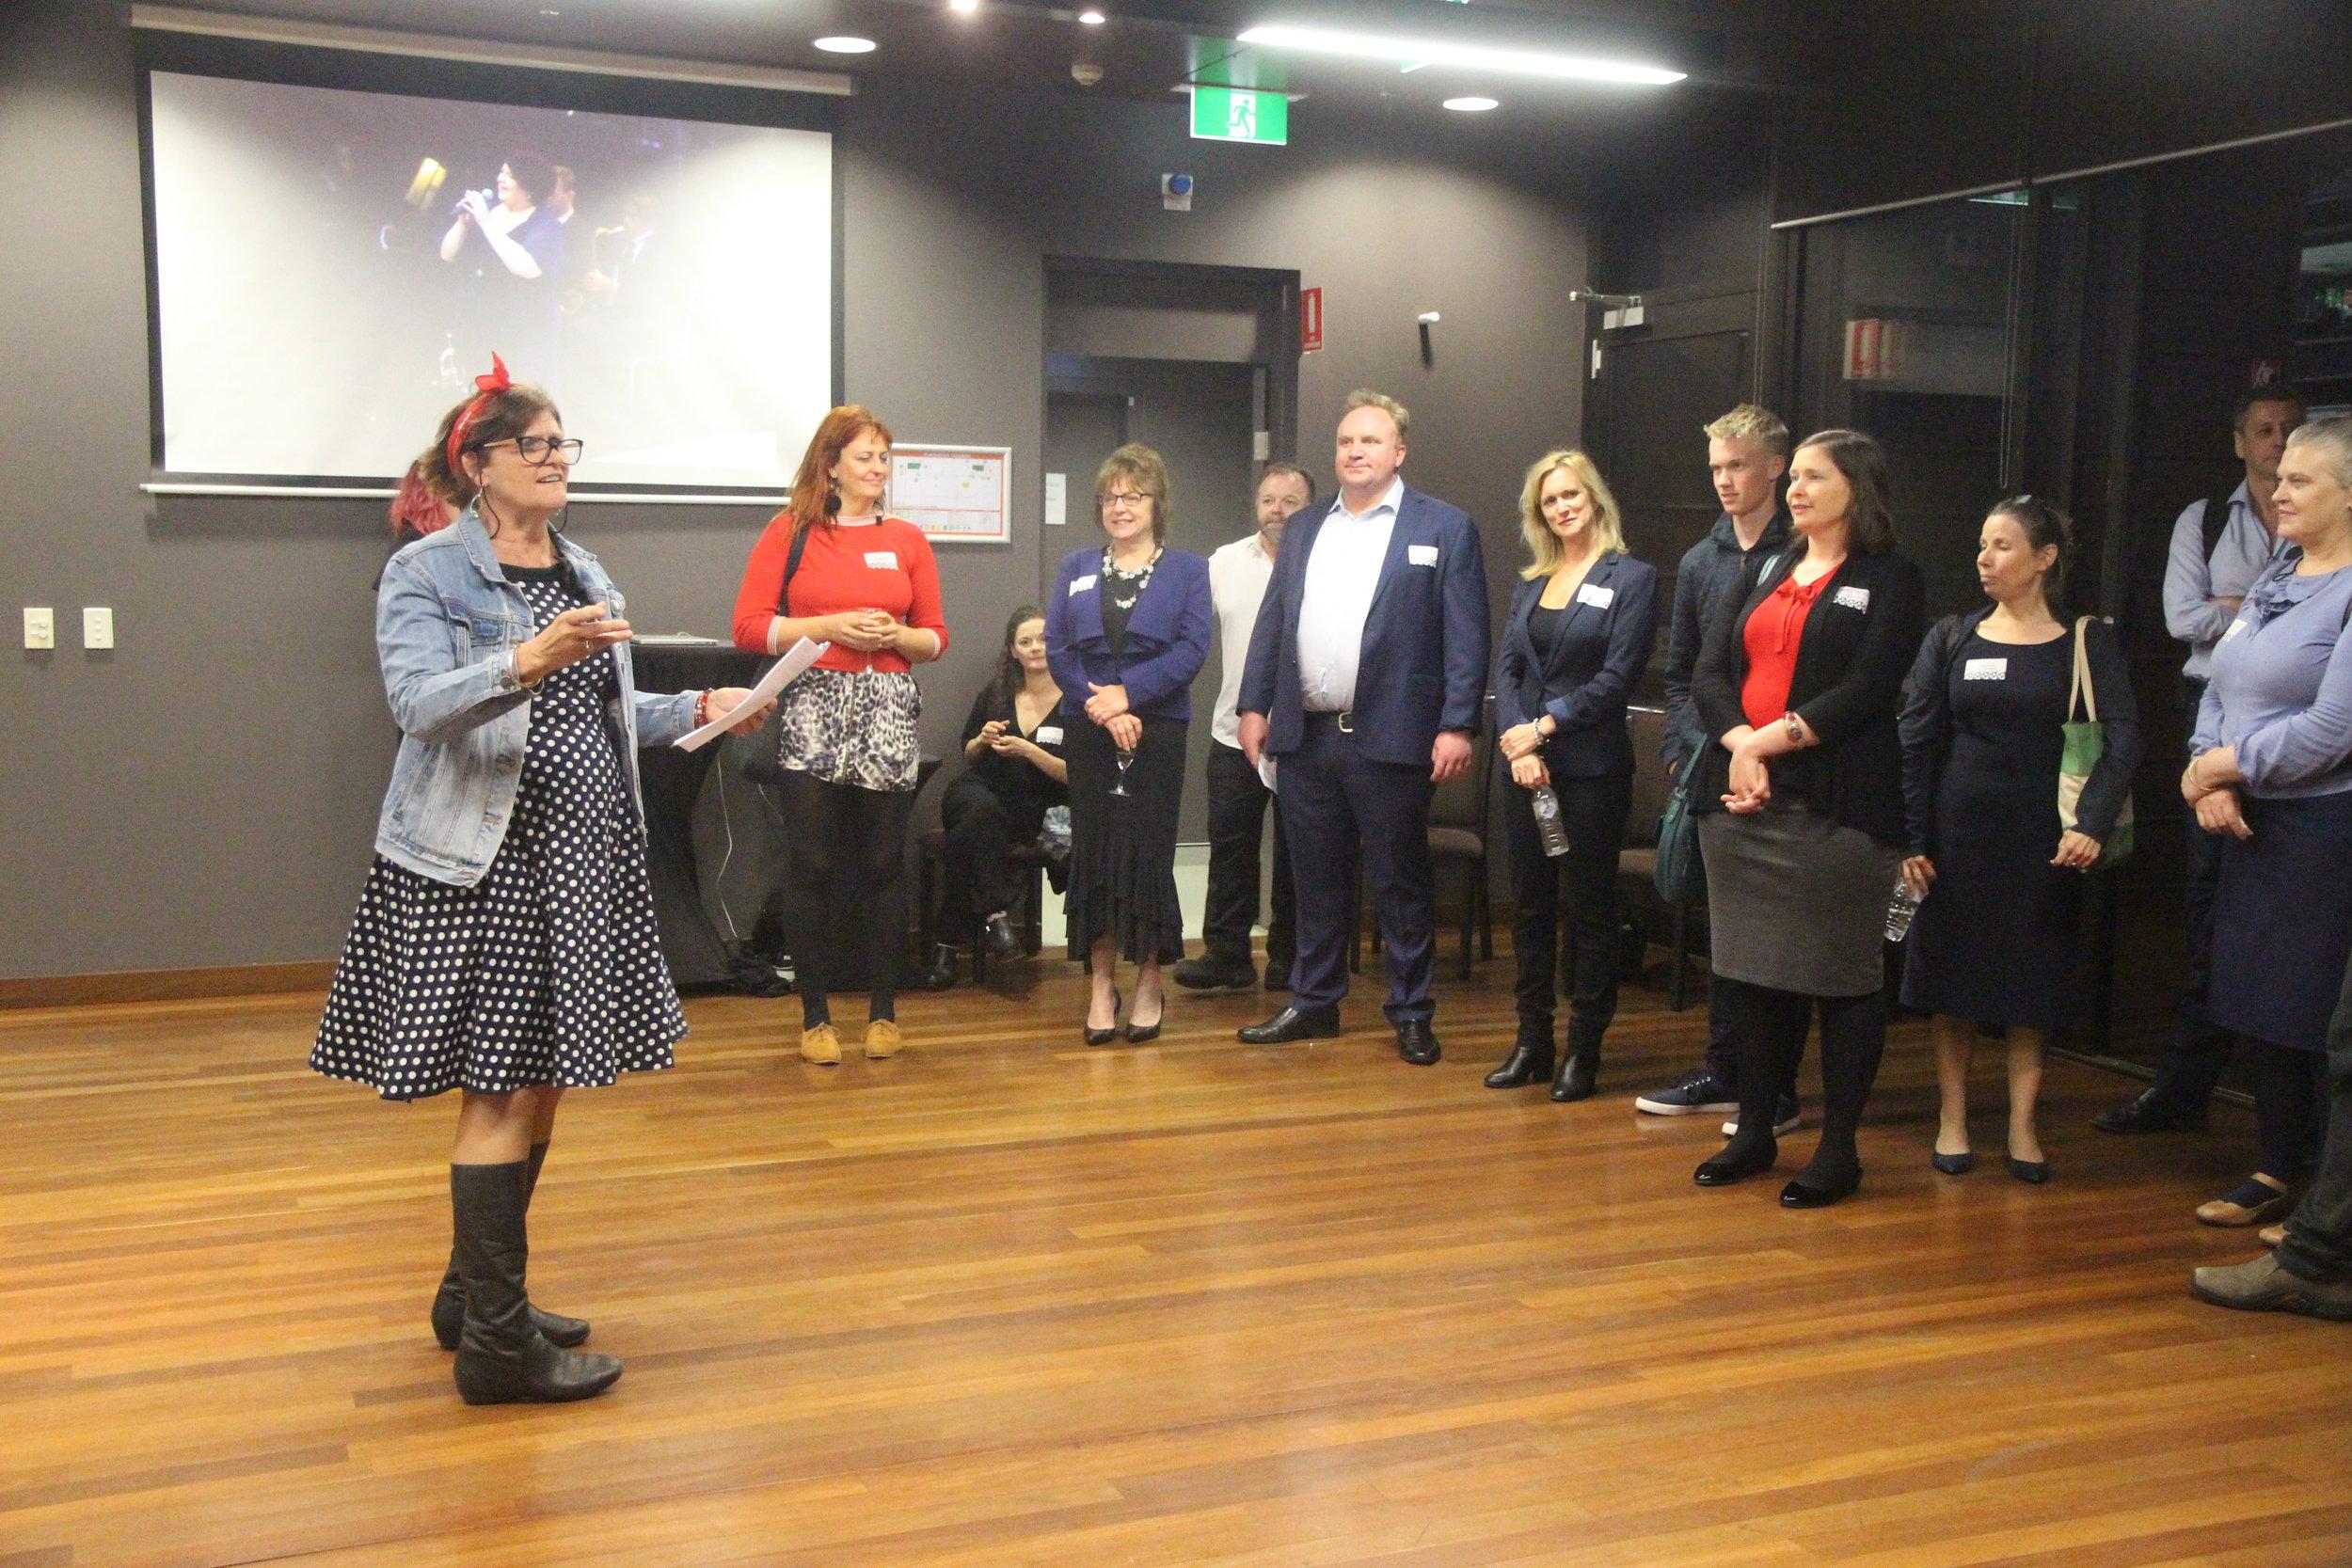 Matilda Awards Sponsorship Evening, photo by Susan Hetherington